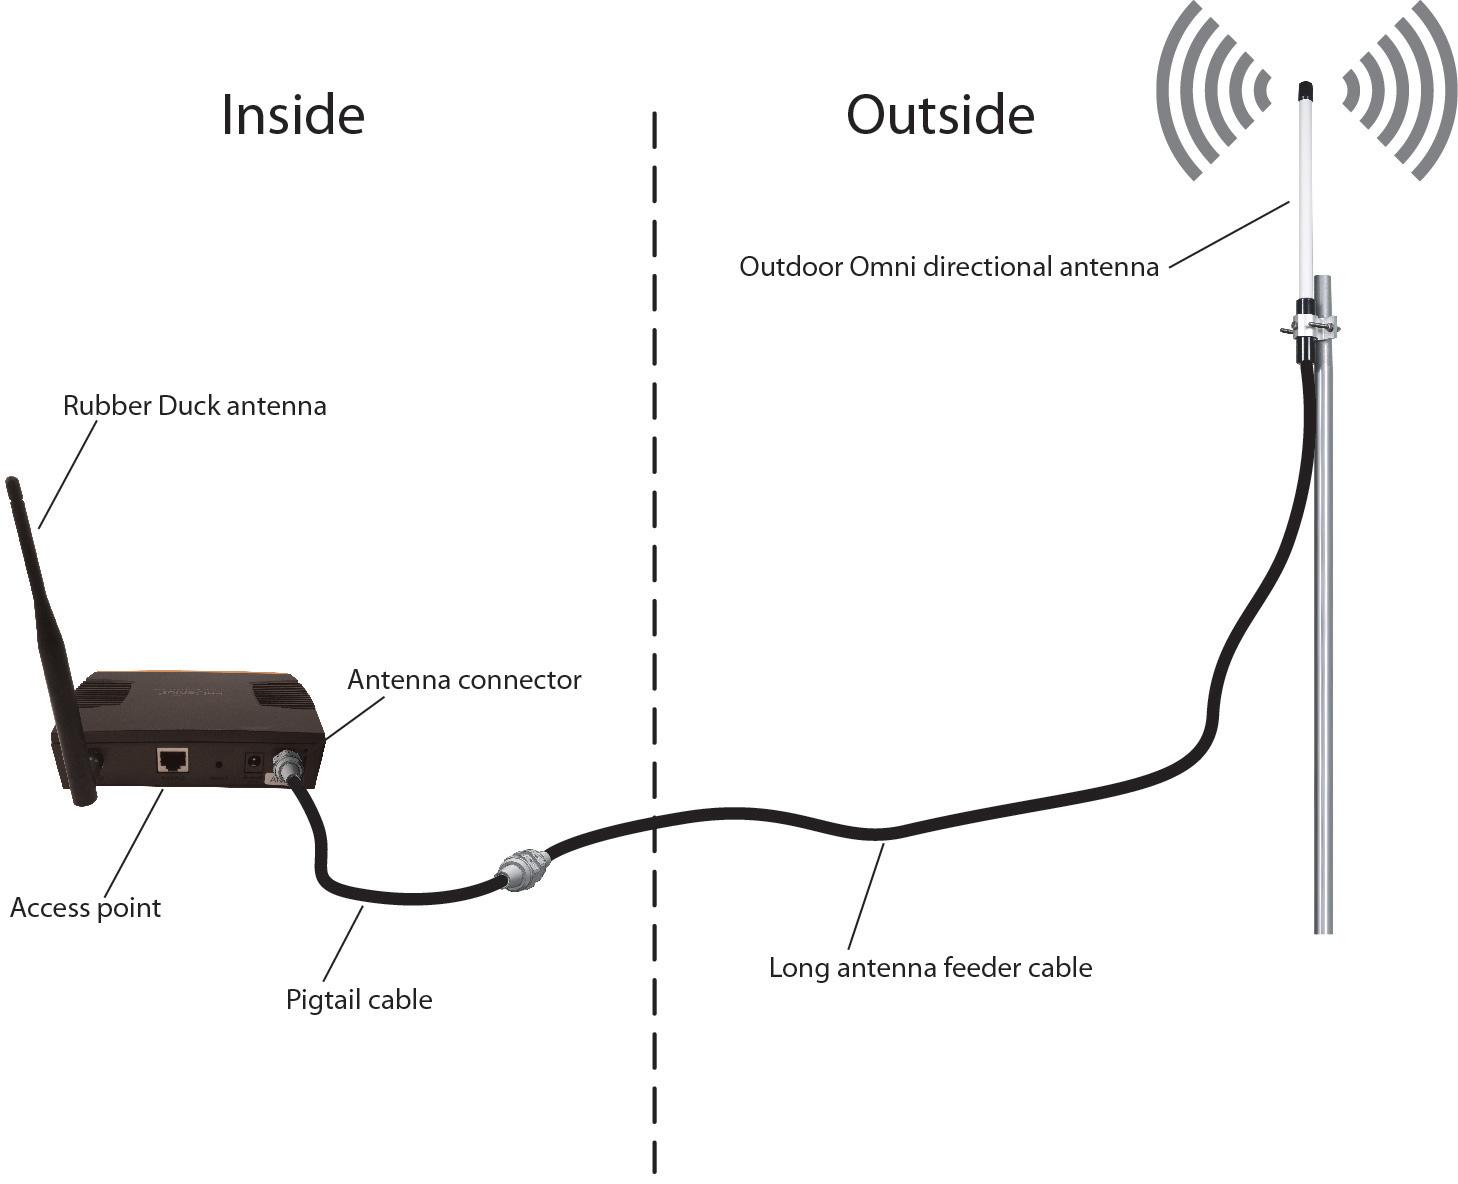 wireless access point comparison chart